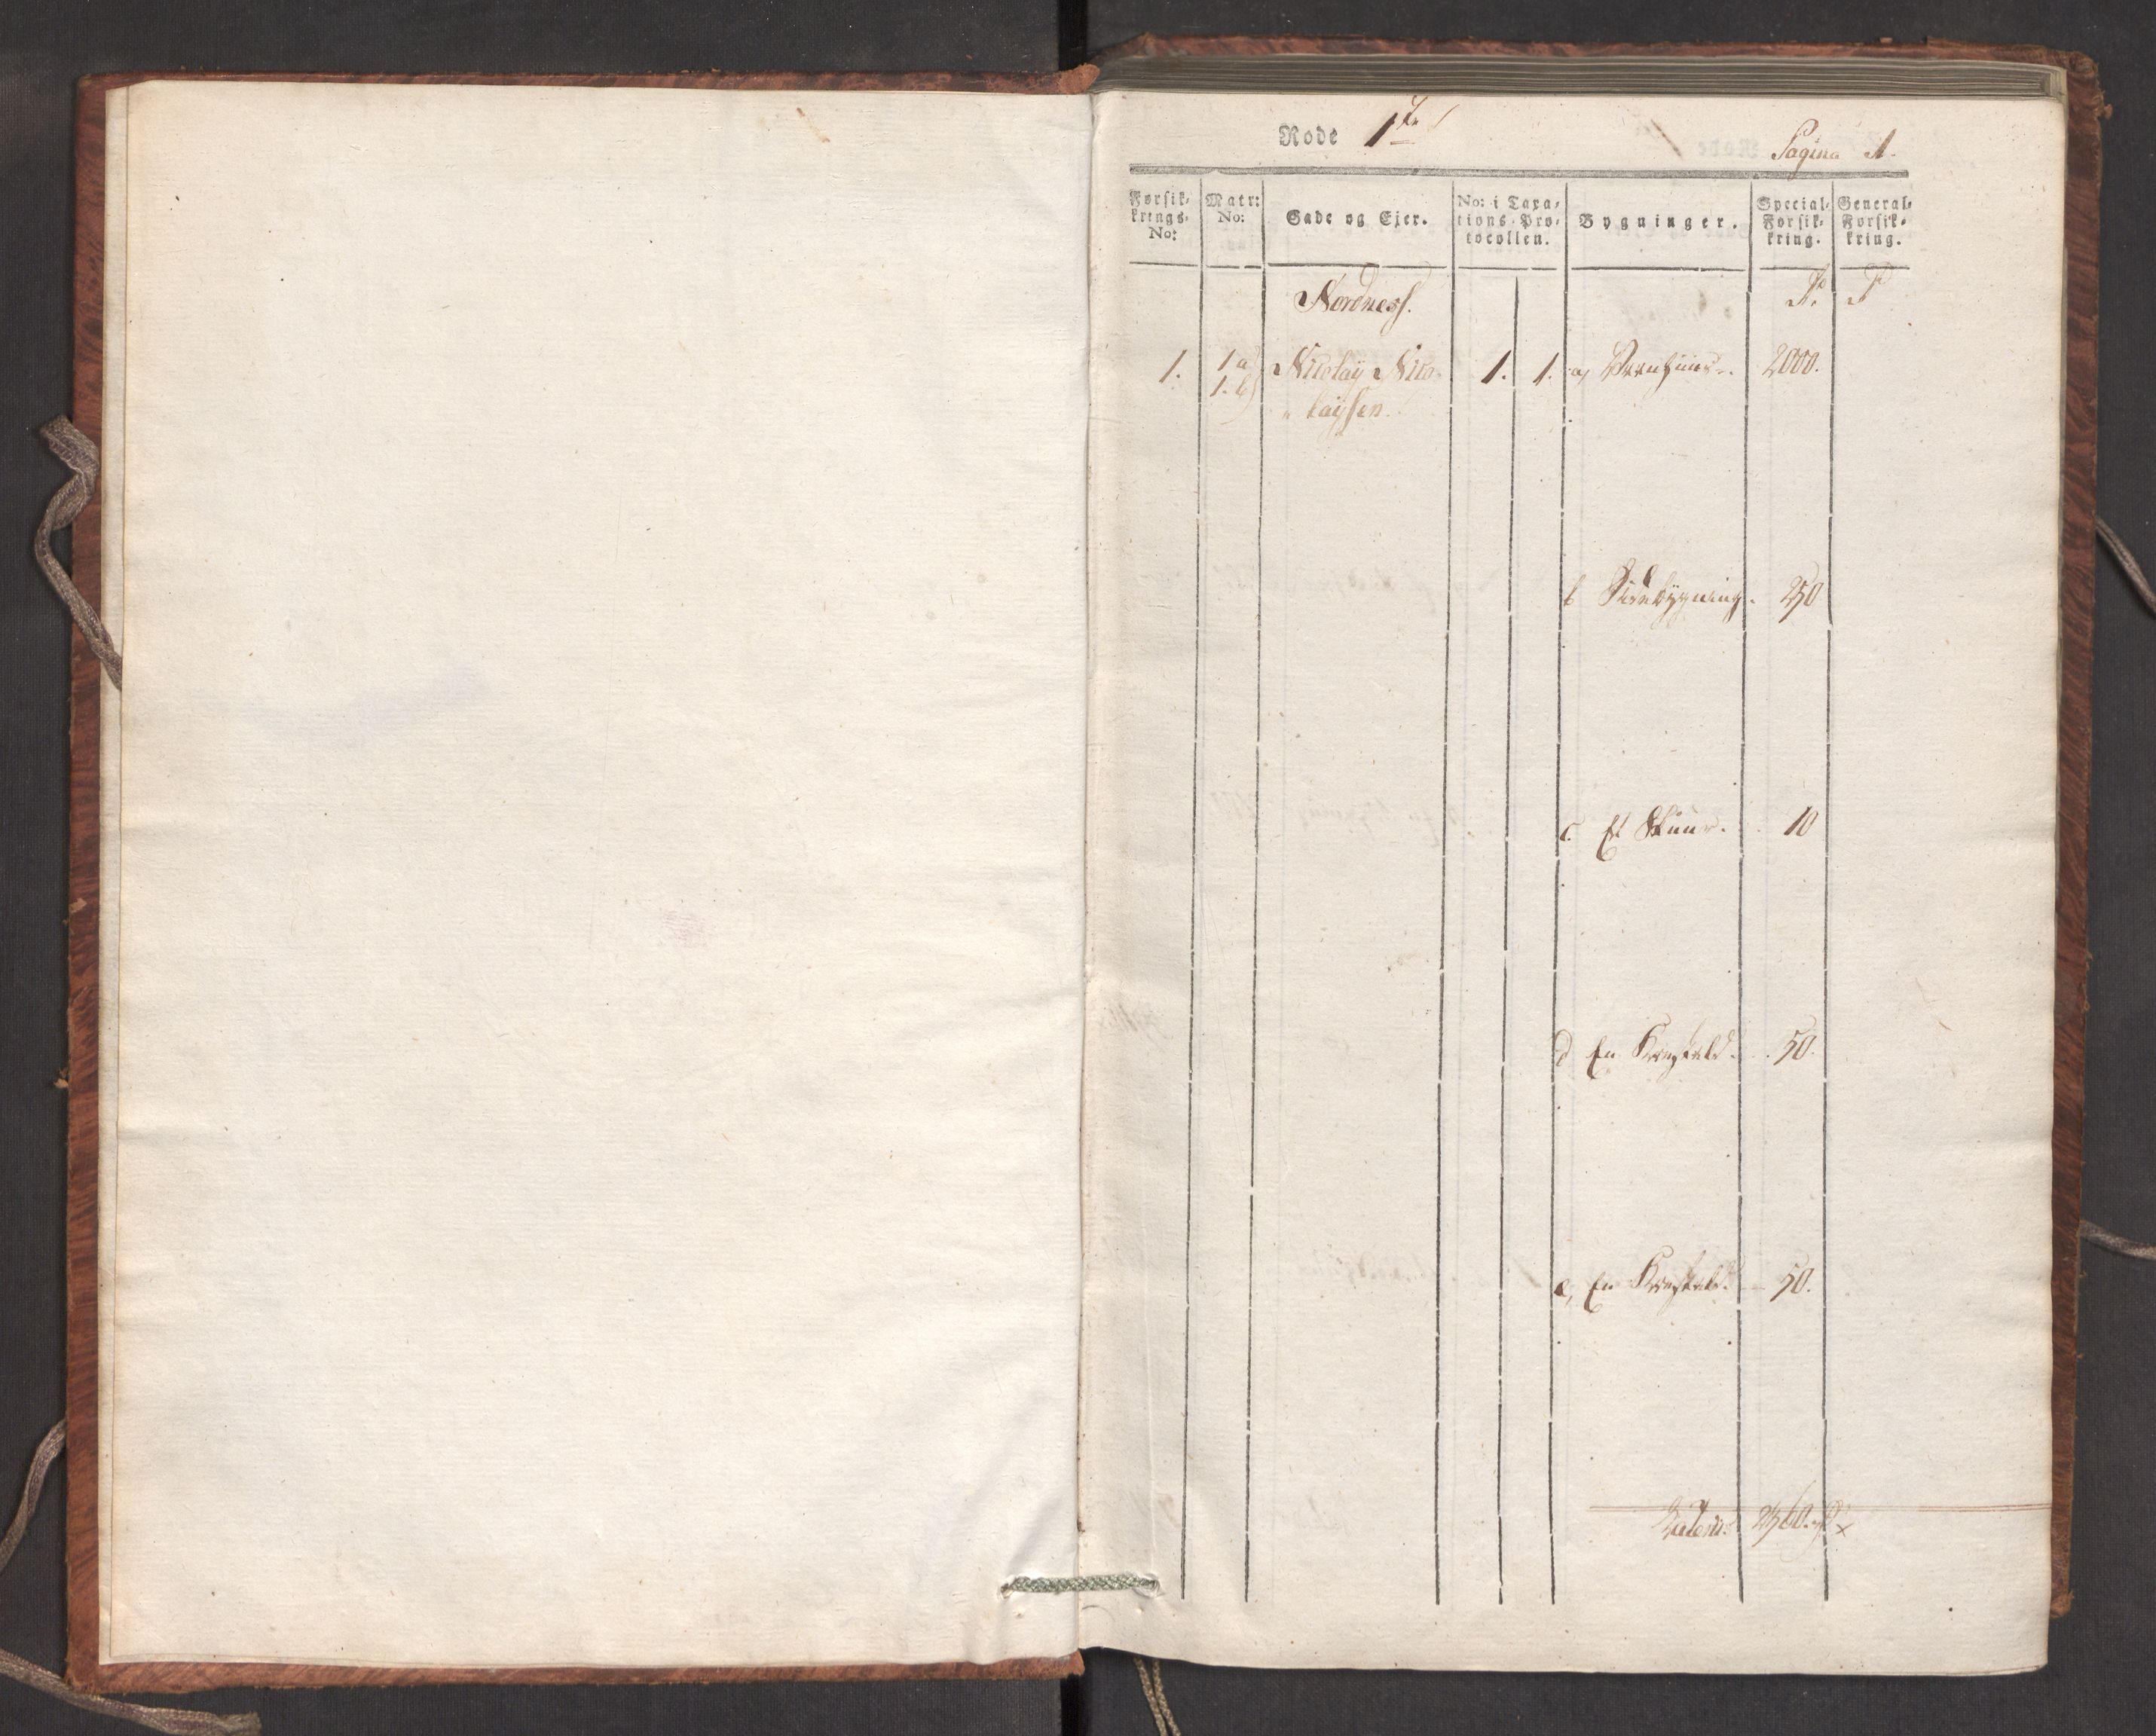 RA, Kommersekollegiet, Brannforsikringskontoret 1767-1814, F/Fa/L0007: Bergen, 1807-1817, s. 1